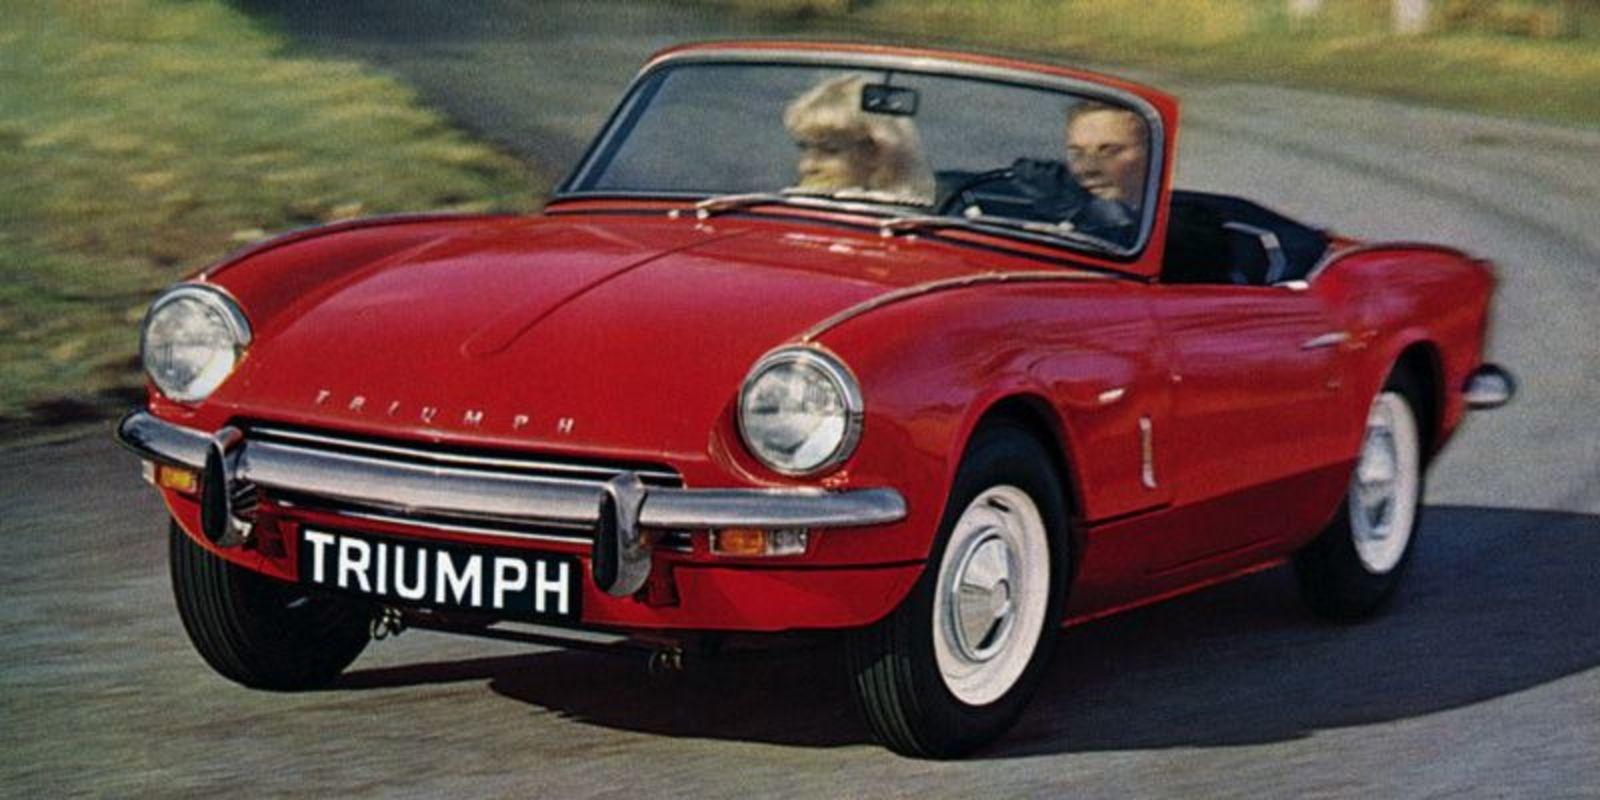 Triumph Spitfire 1967